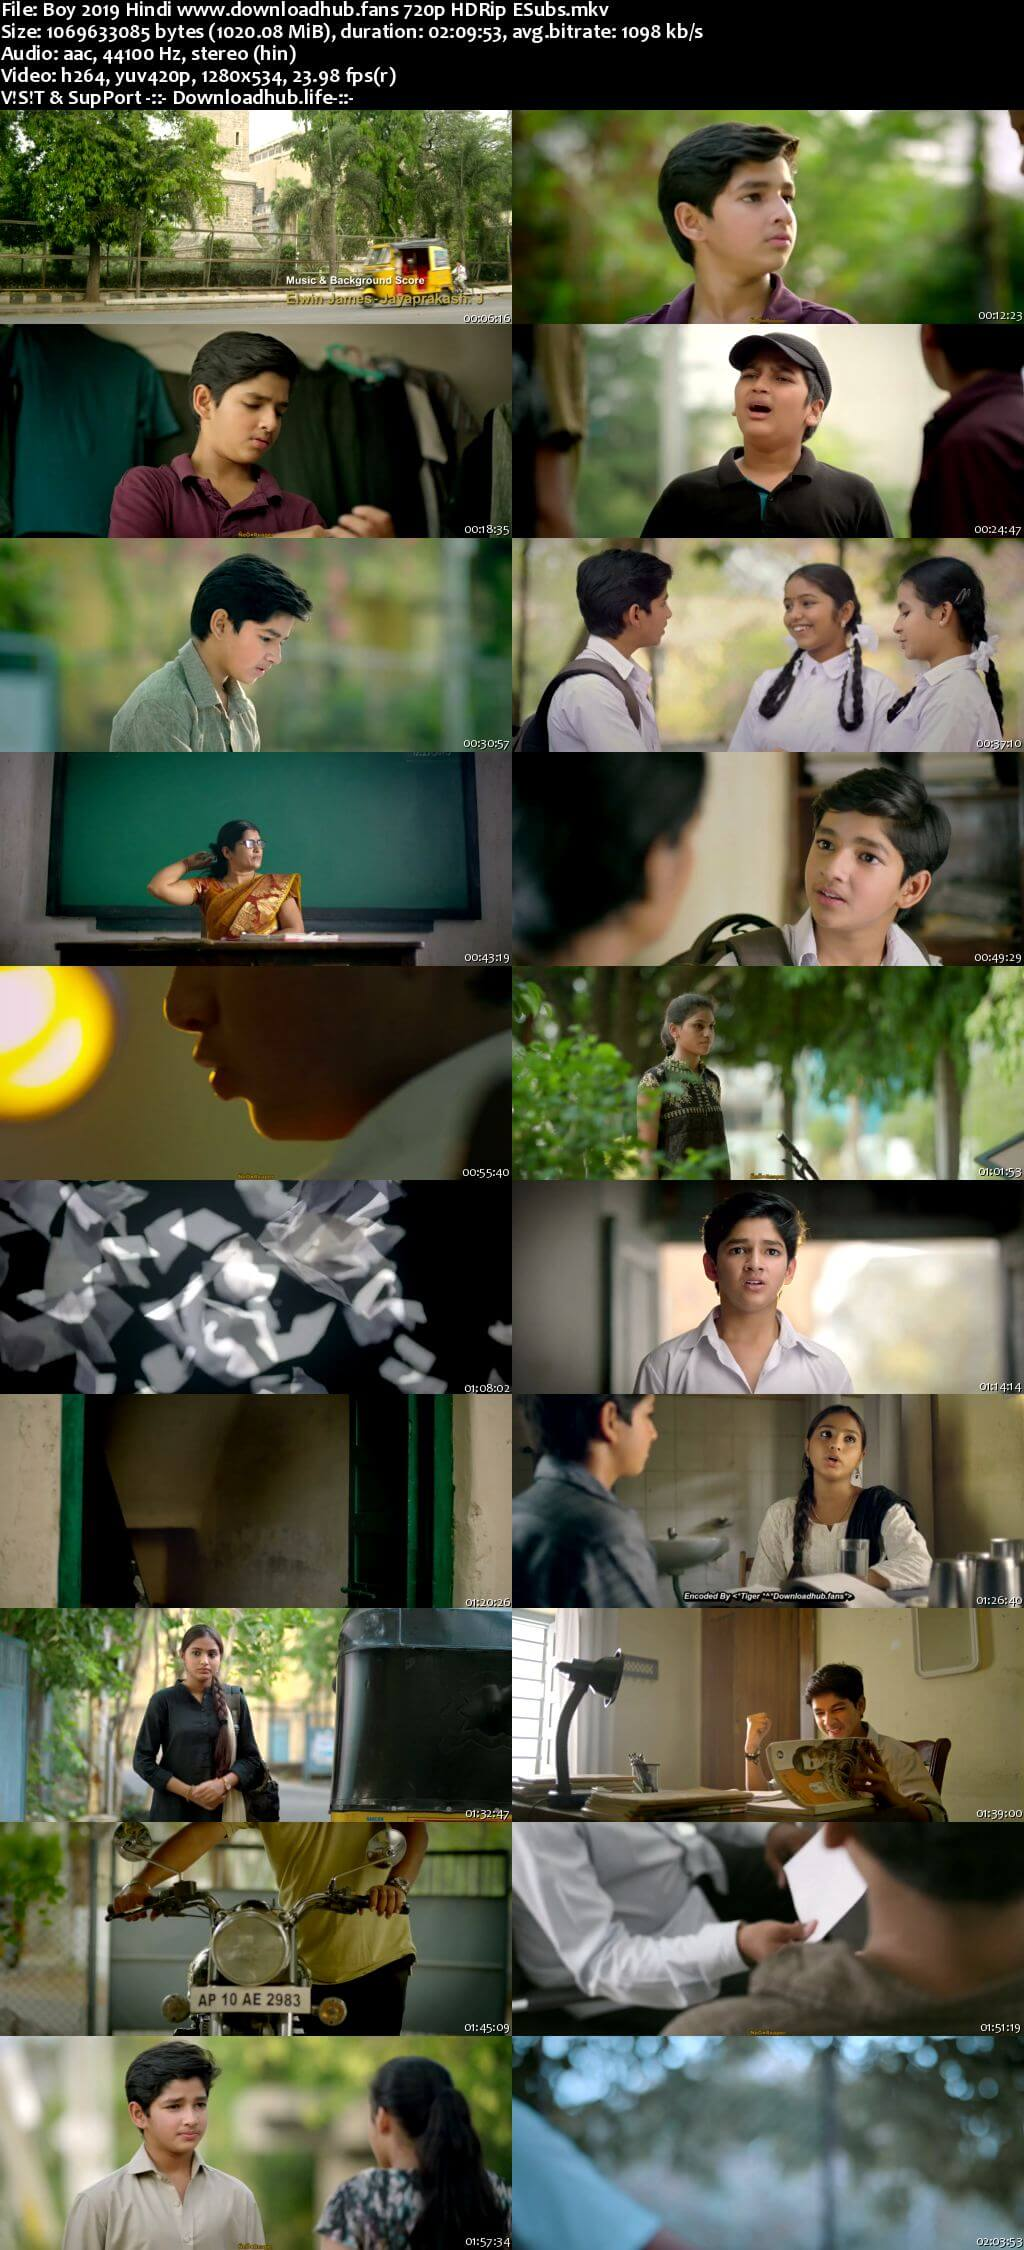 Boy 2019 Hindi 720p HDRip ESubs